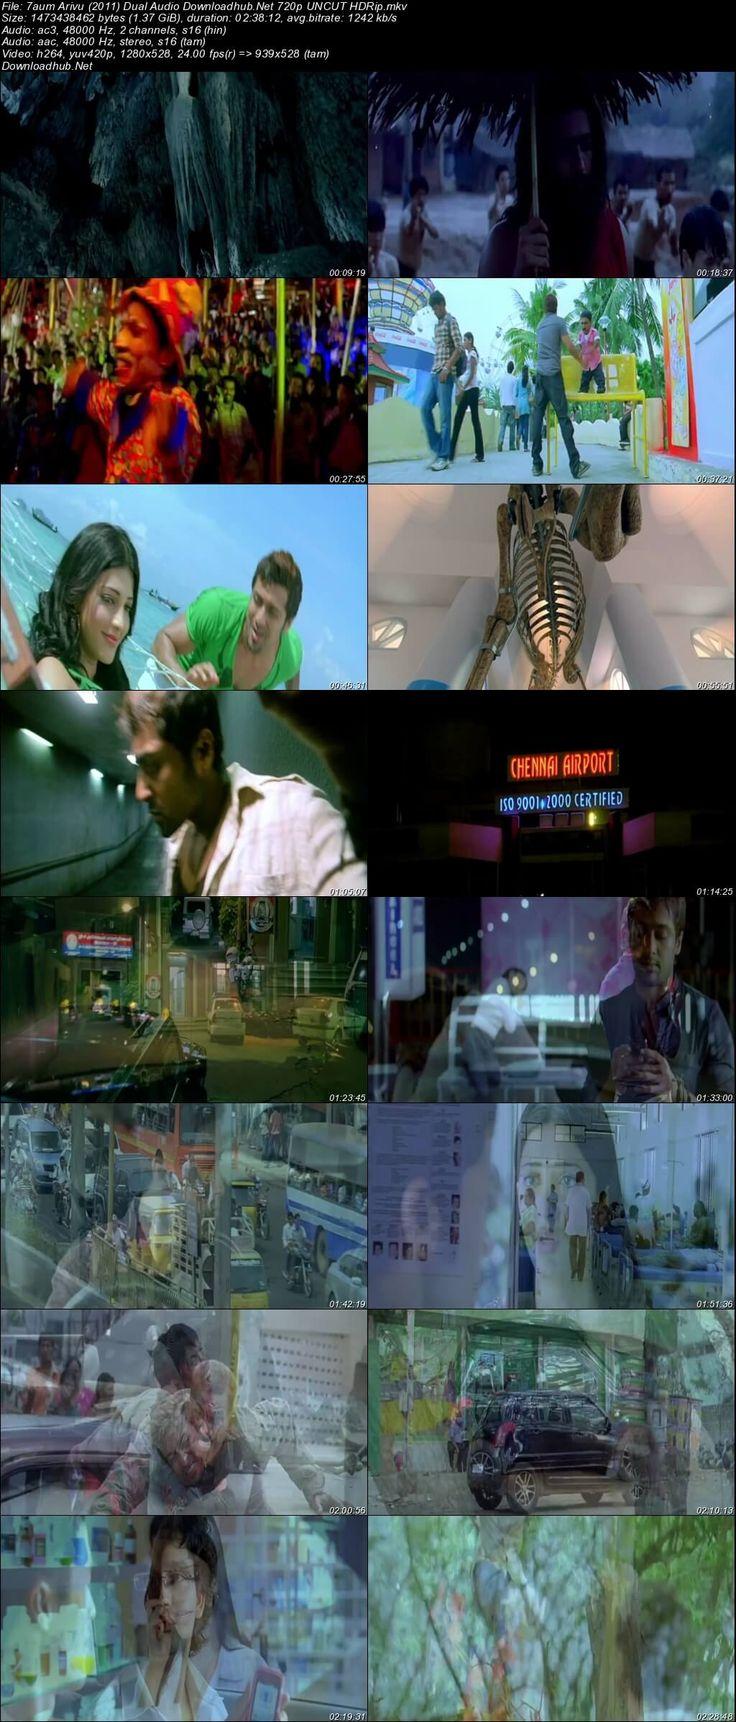 Screenshot Of 7 Aum Arivu 2011 Dual Audio 720p HDRip [Hindi - Tamil] - UNCUT Resumeable Single Free Download Links Watch Online Free At Downloadhub.Net